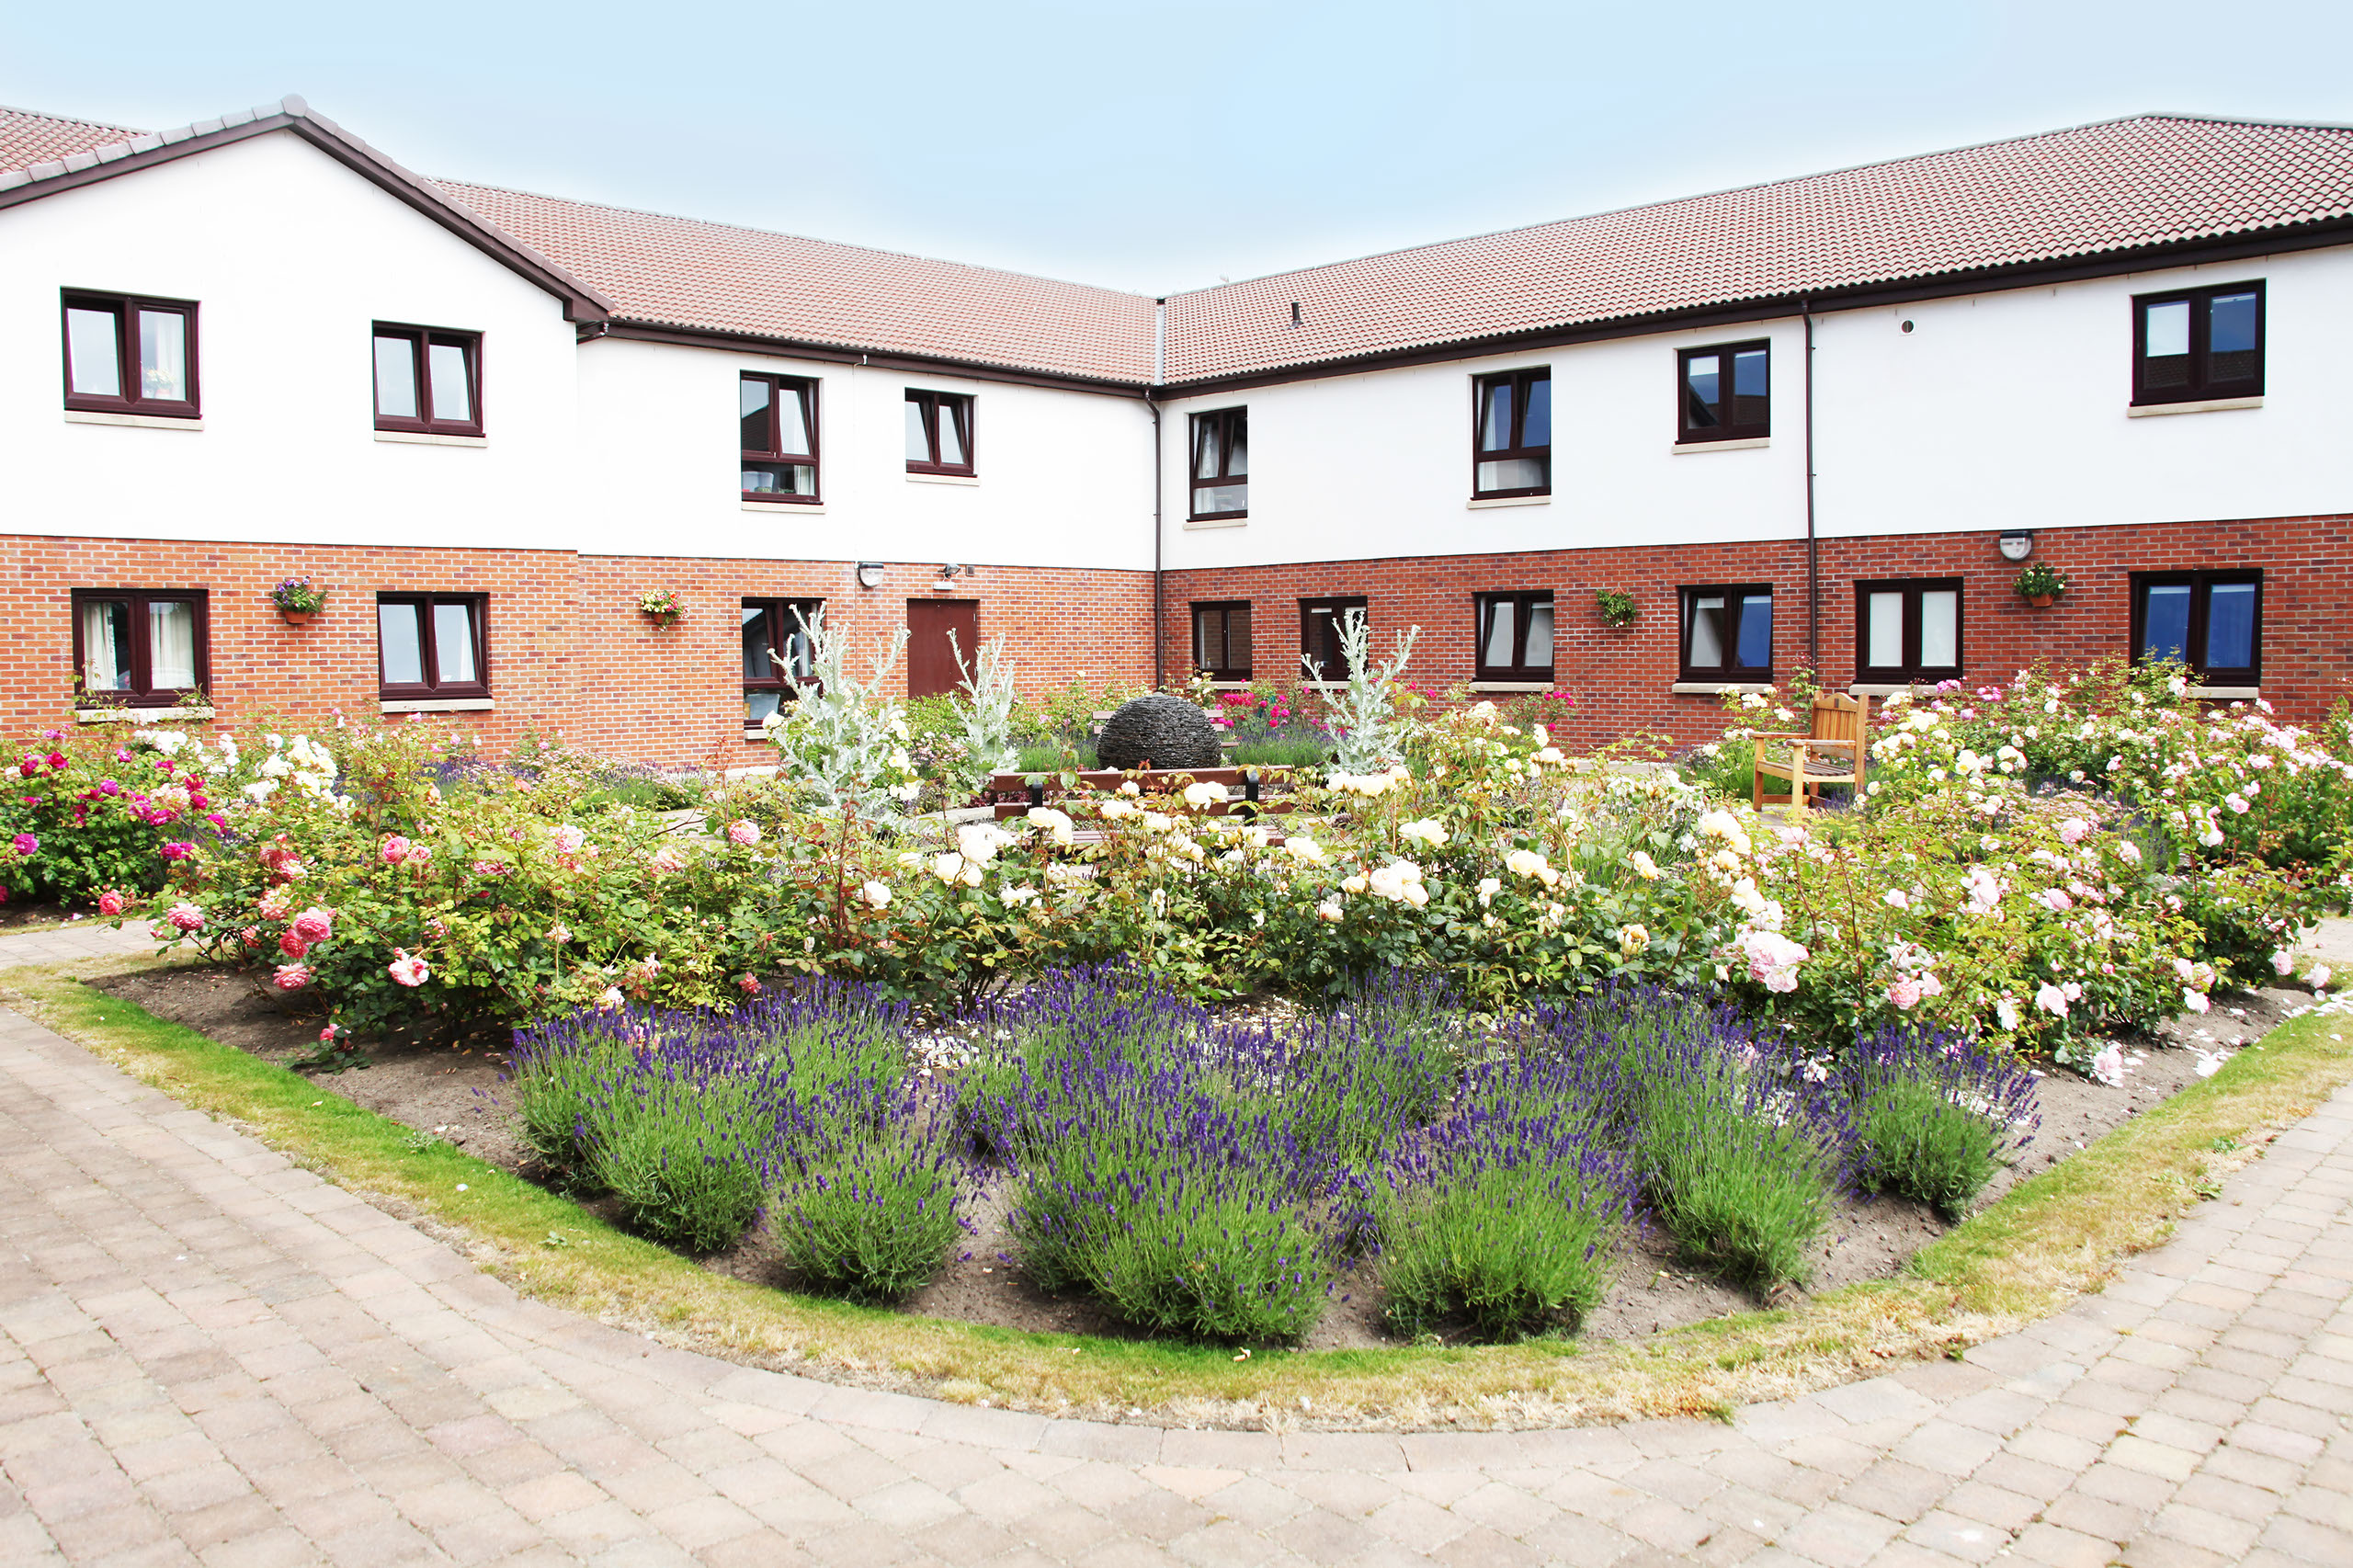 100 Nursing Homes Near Ashford The Meadows Of